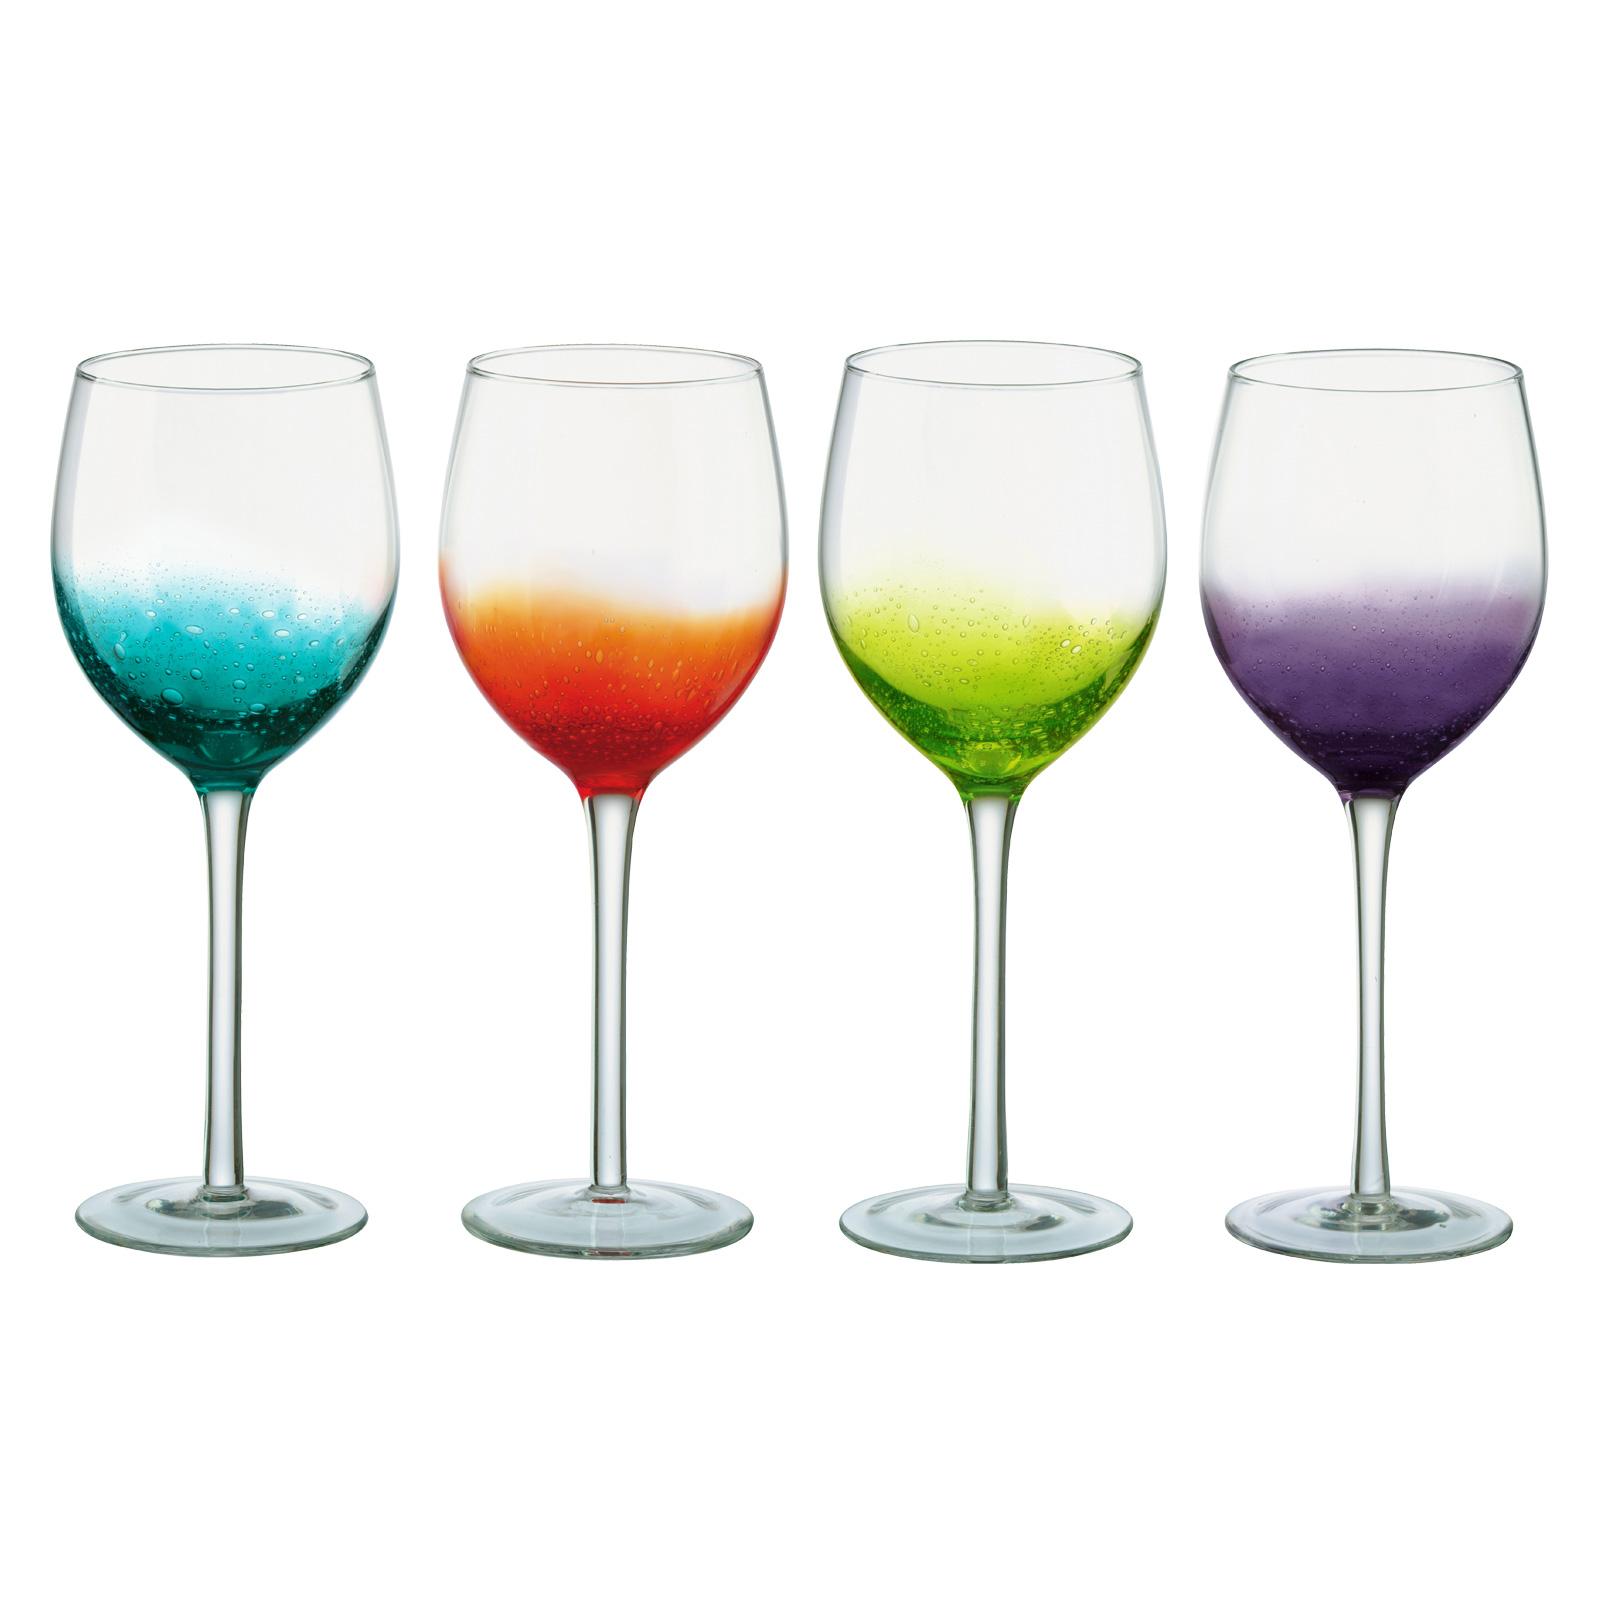 Fizz Wine Glasses - Set of 4